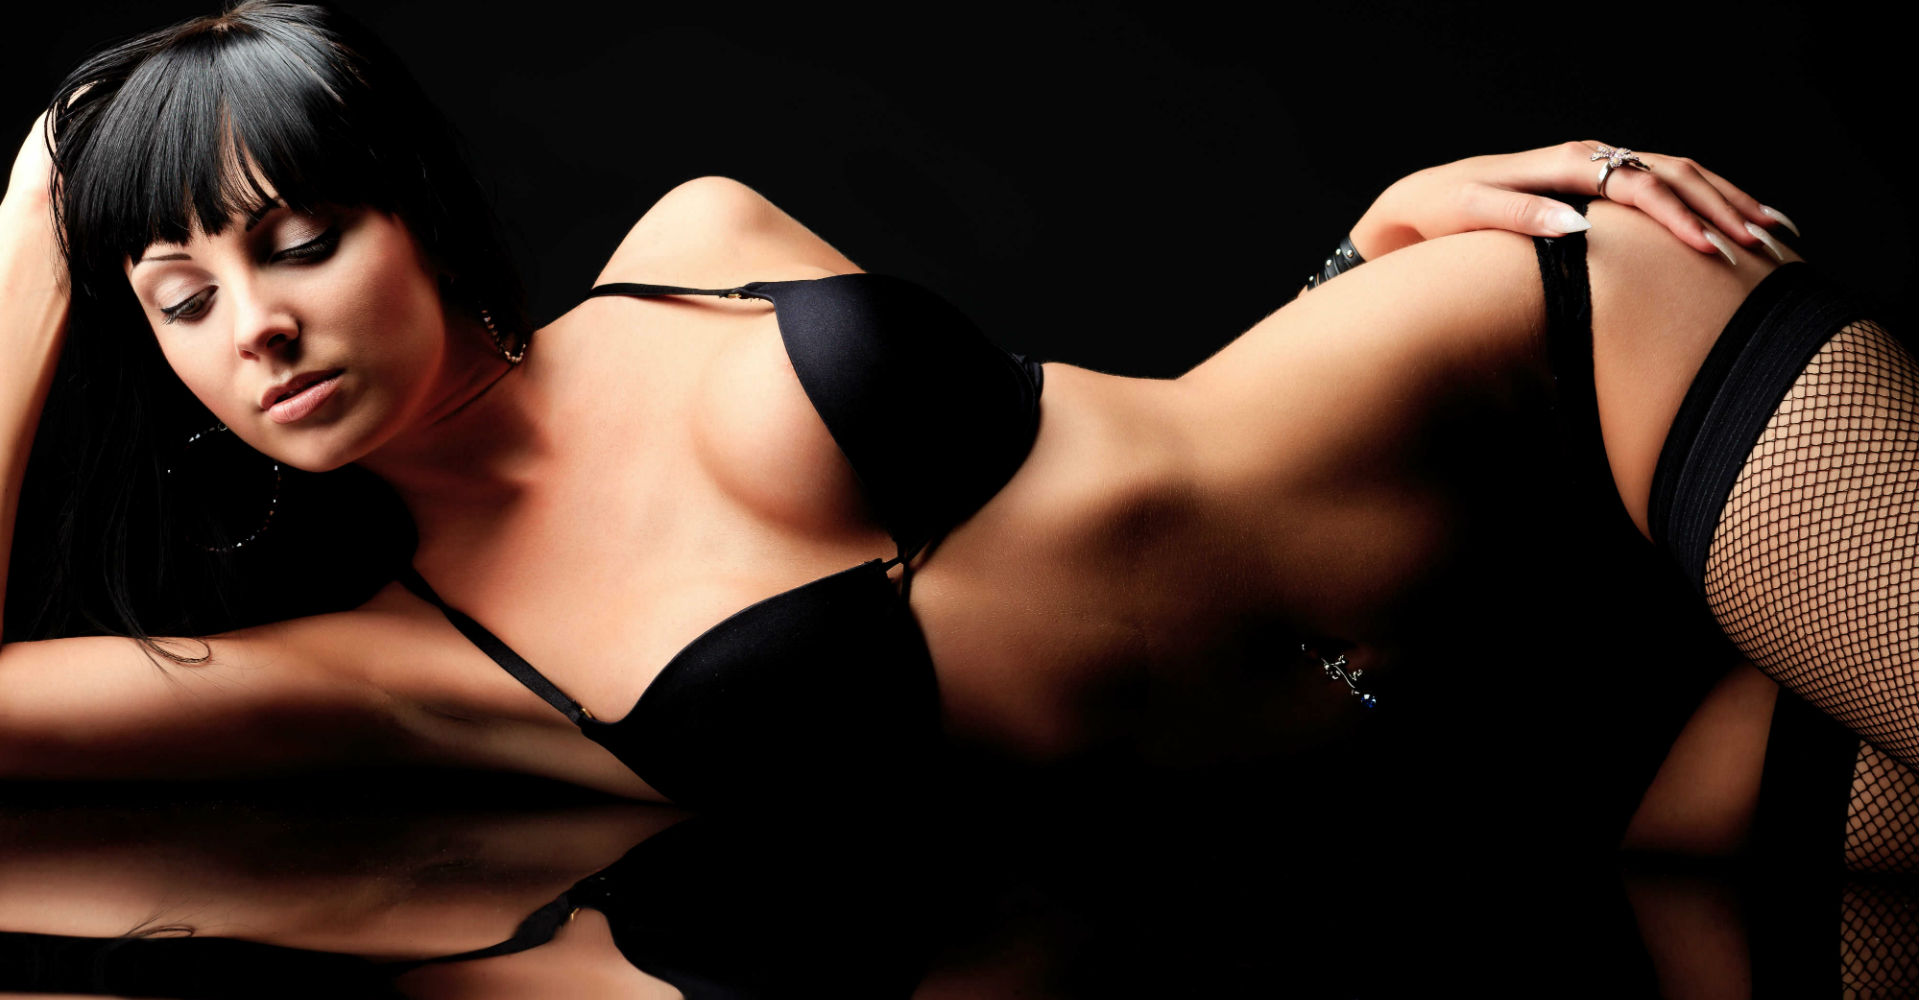 Lomi Lomi Massage   Erotic Massage   Brothel - Bodyline